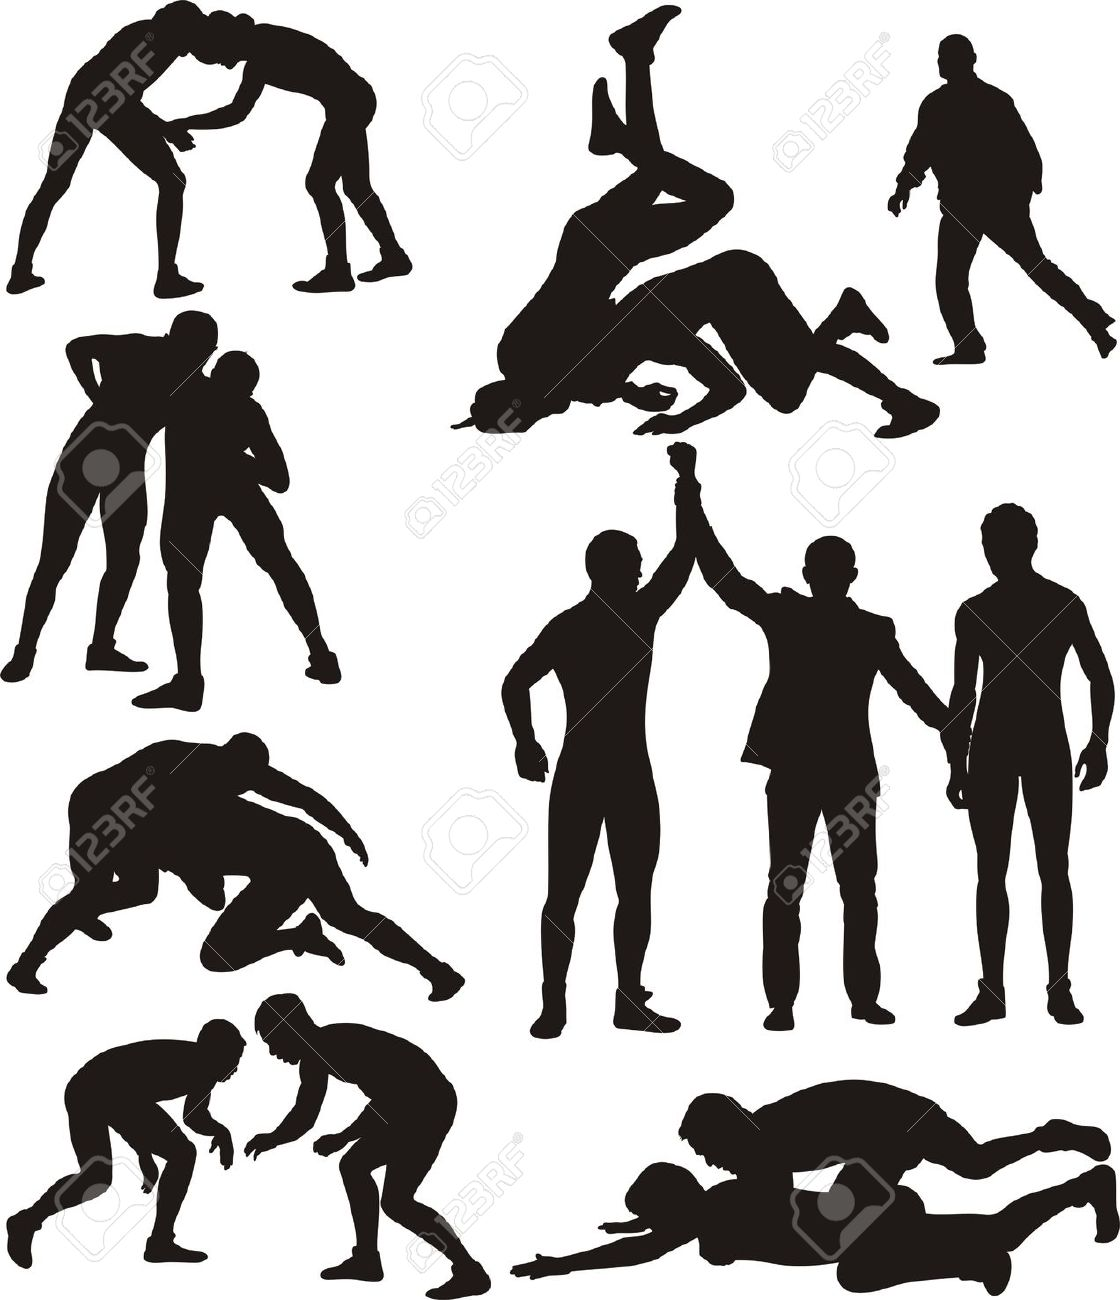 Wrestling clipart silhouette 3